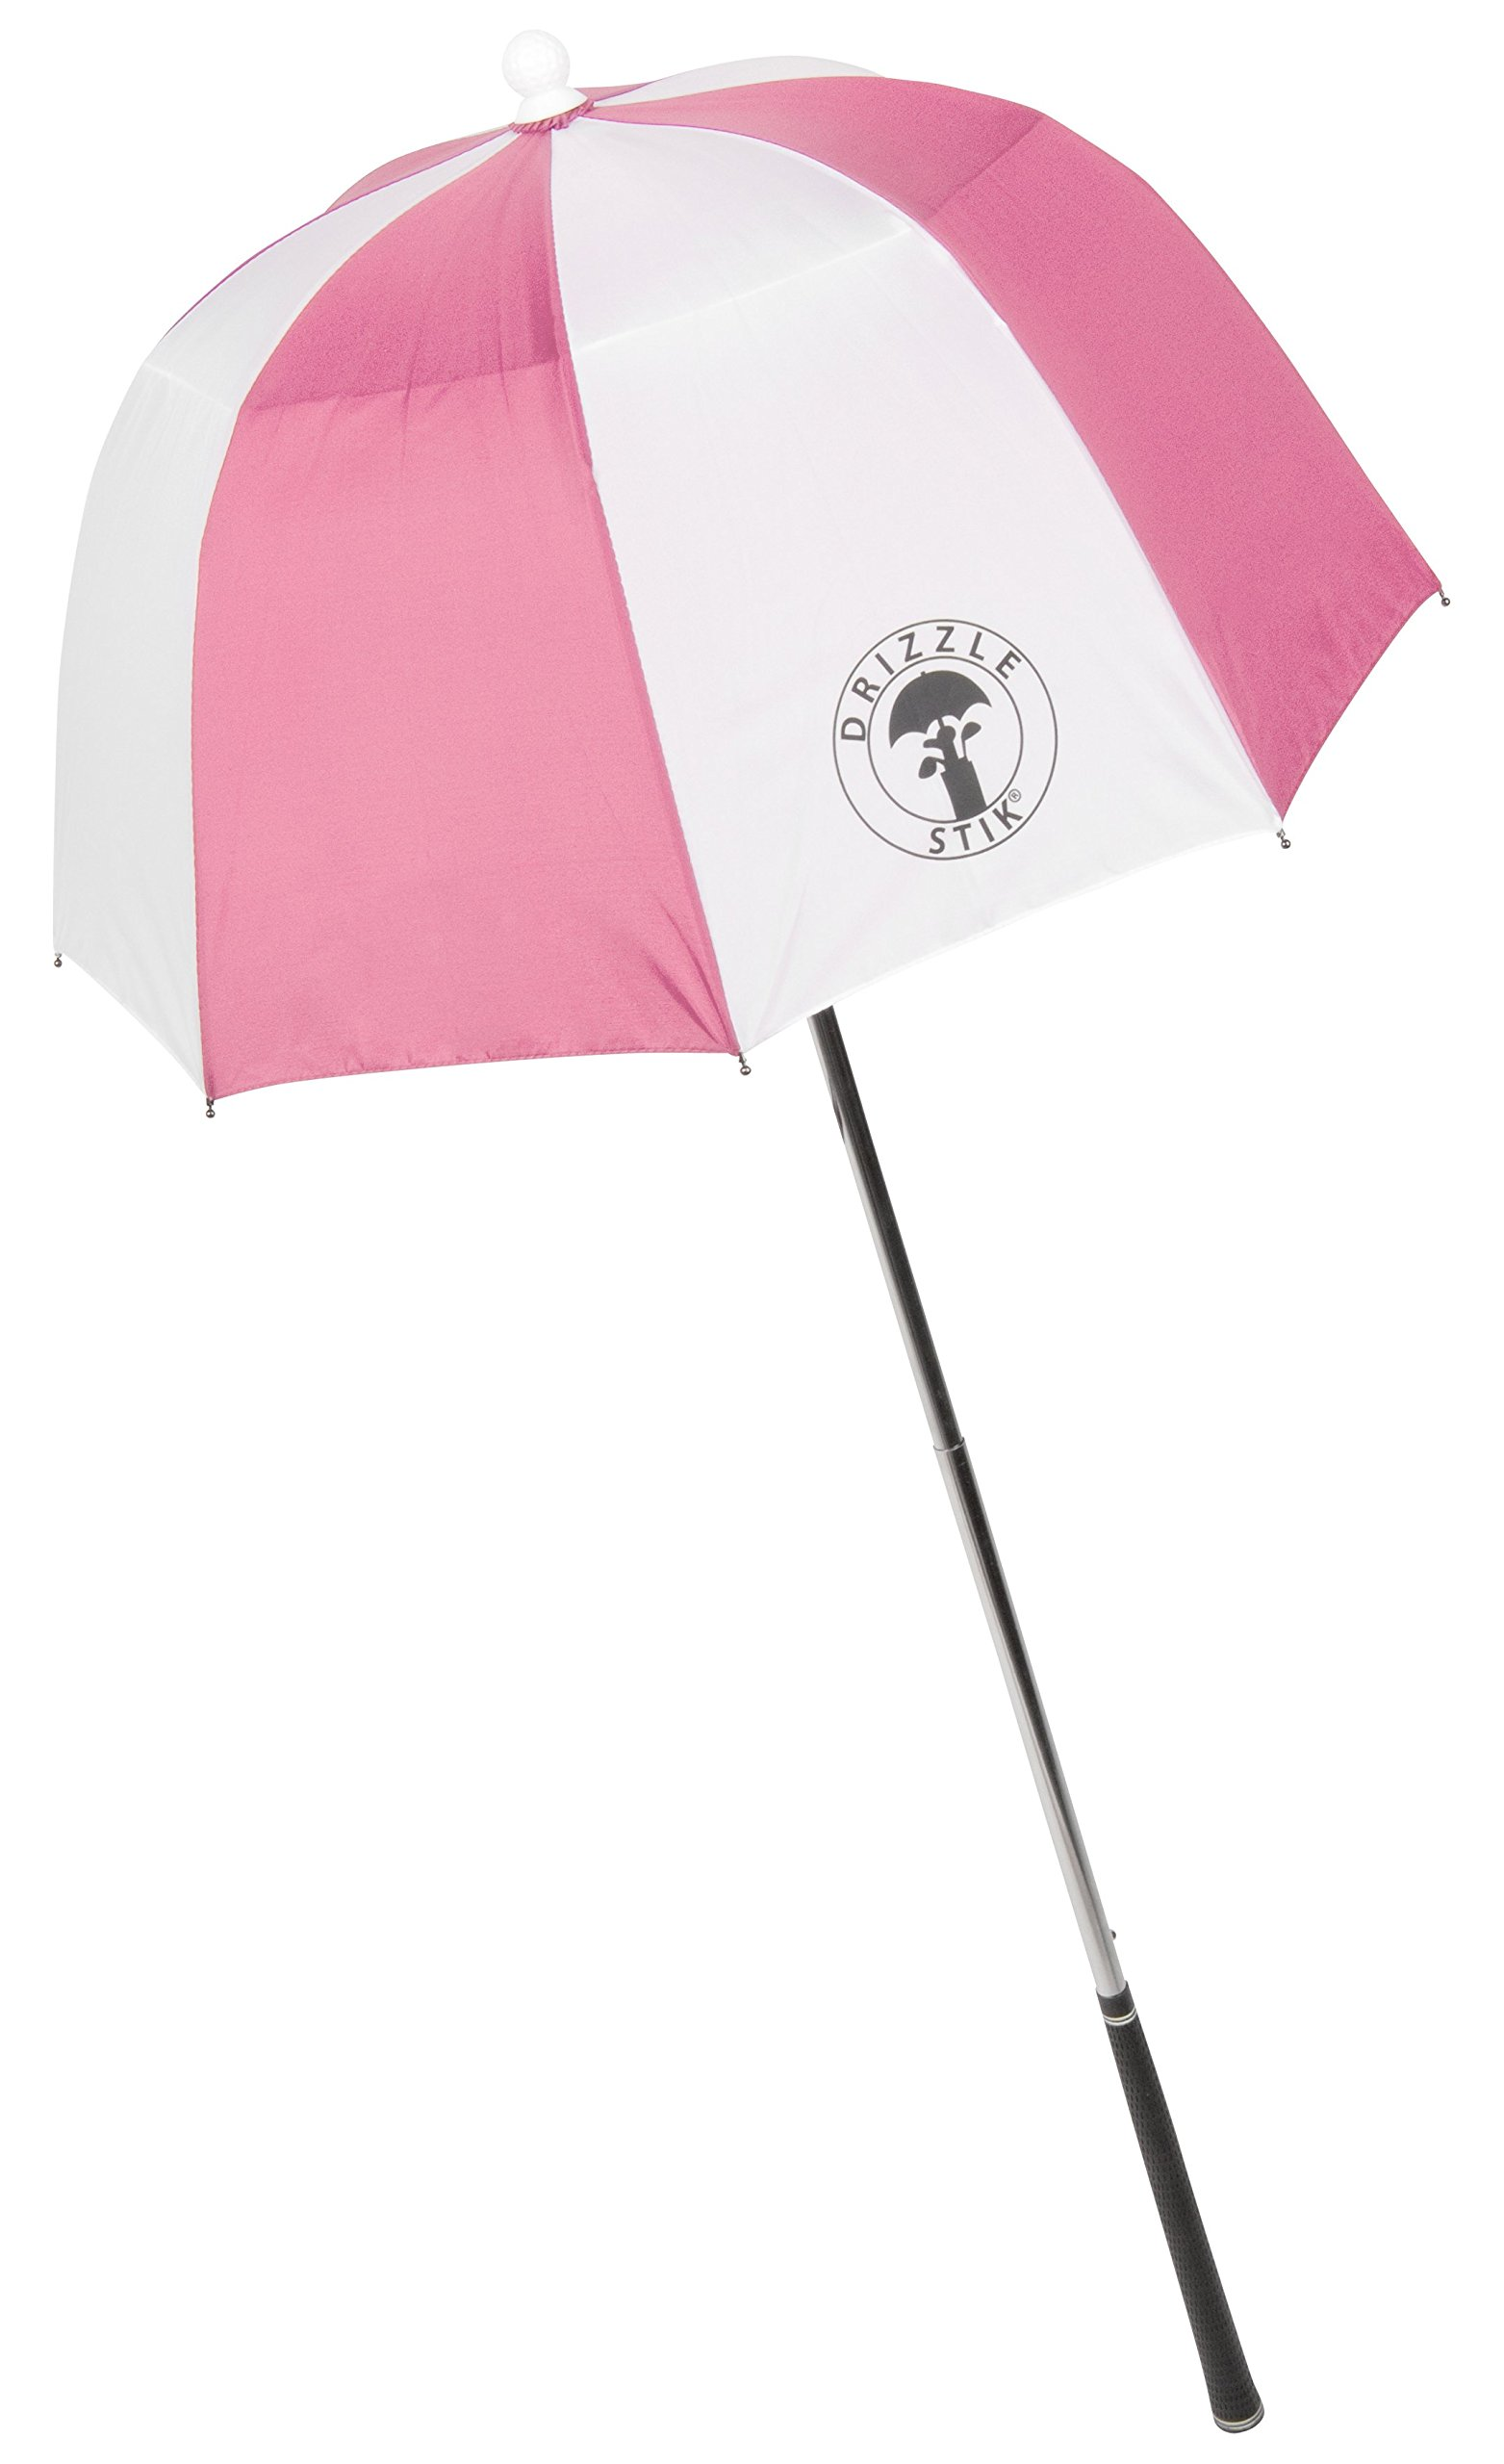 Drizzle Stik Flex- Golf Club Umbrella by Drizzle Stik